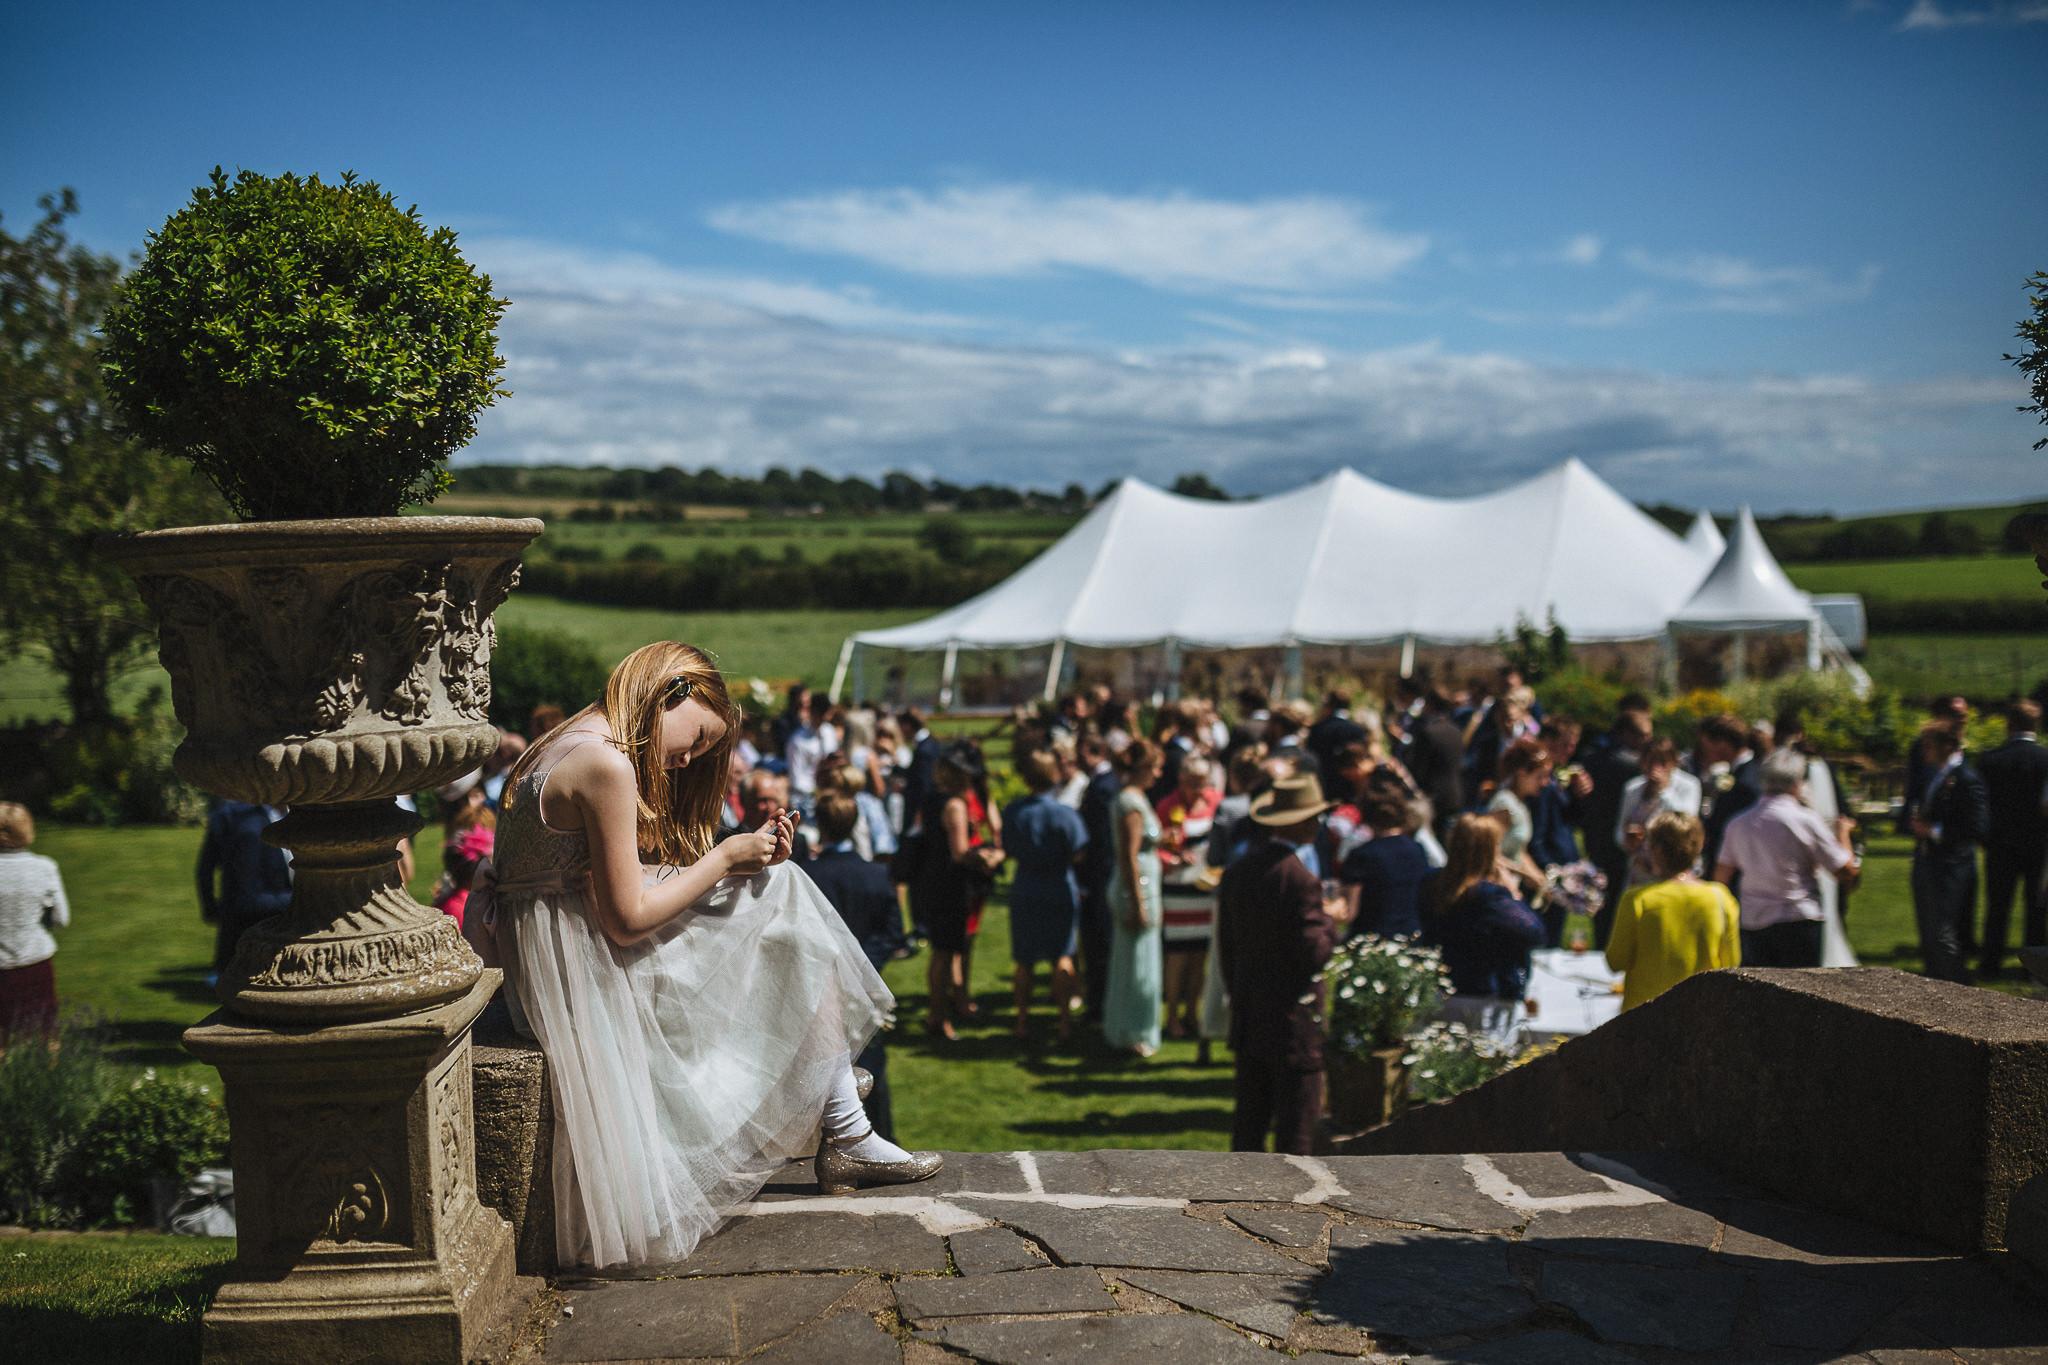 paul-marbrook-Farm-Wedding-Photographer-Lancashire-90049